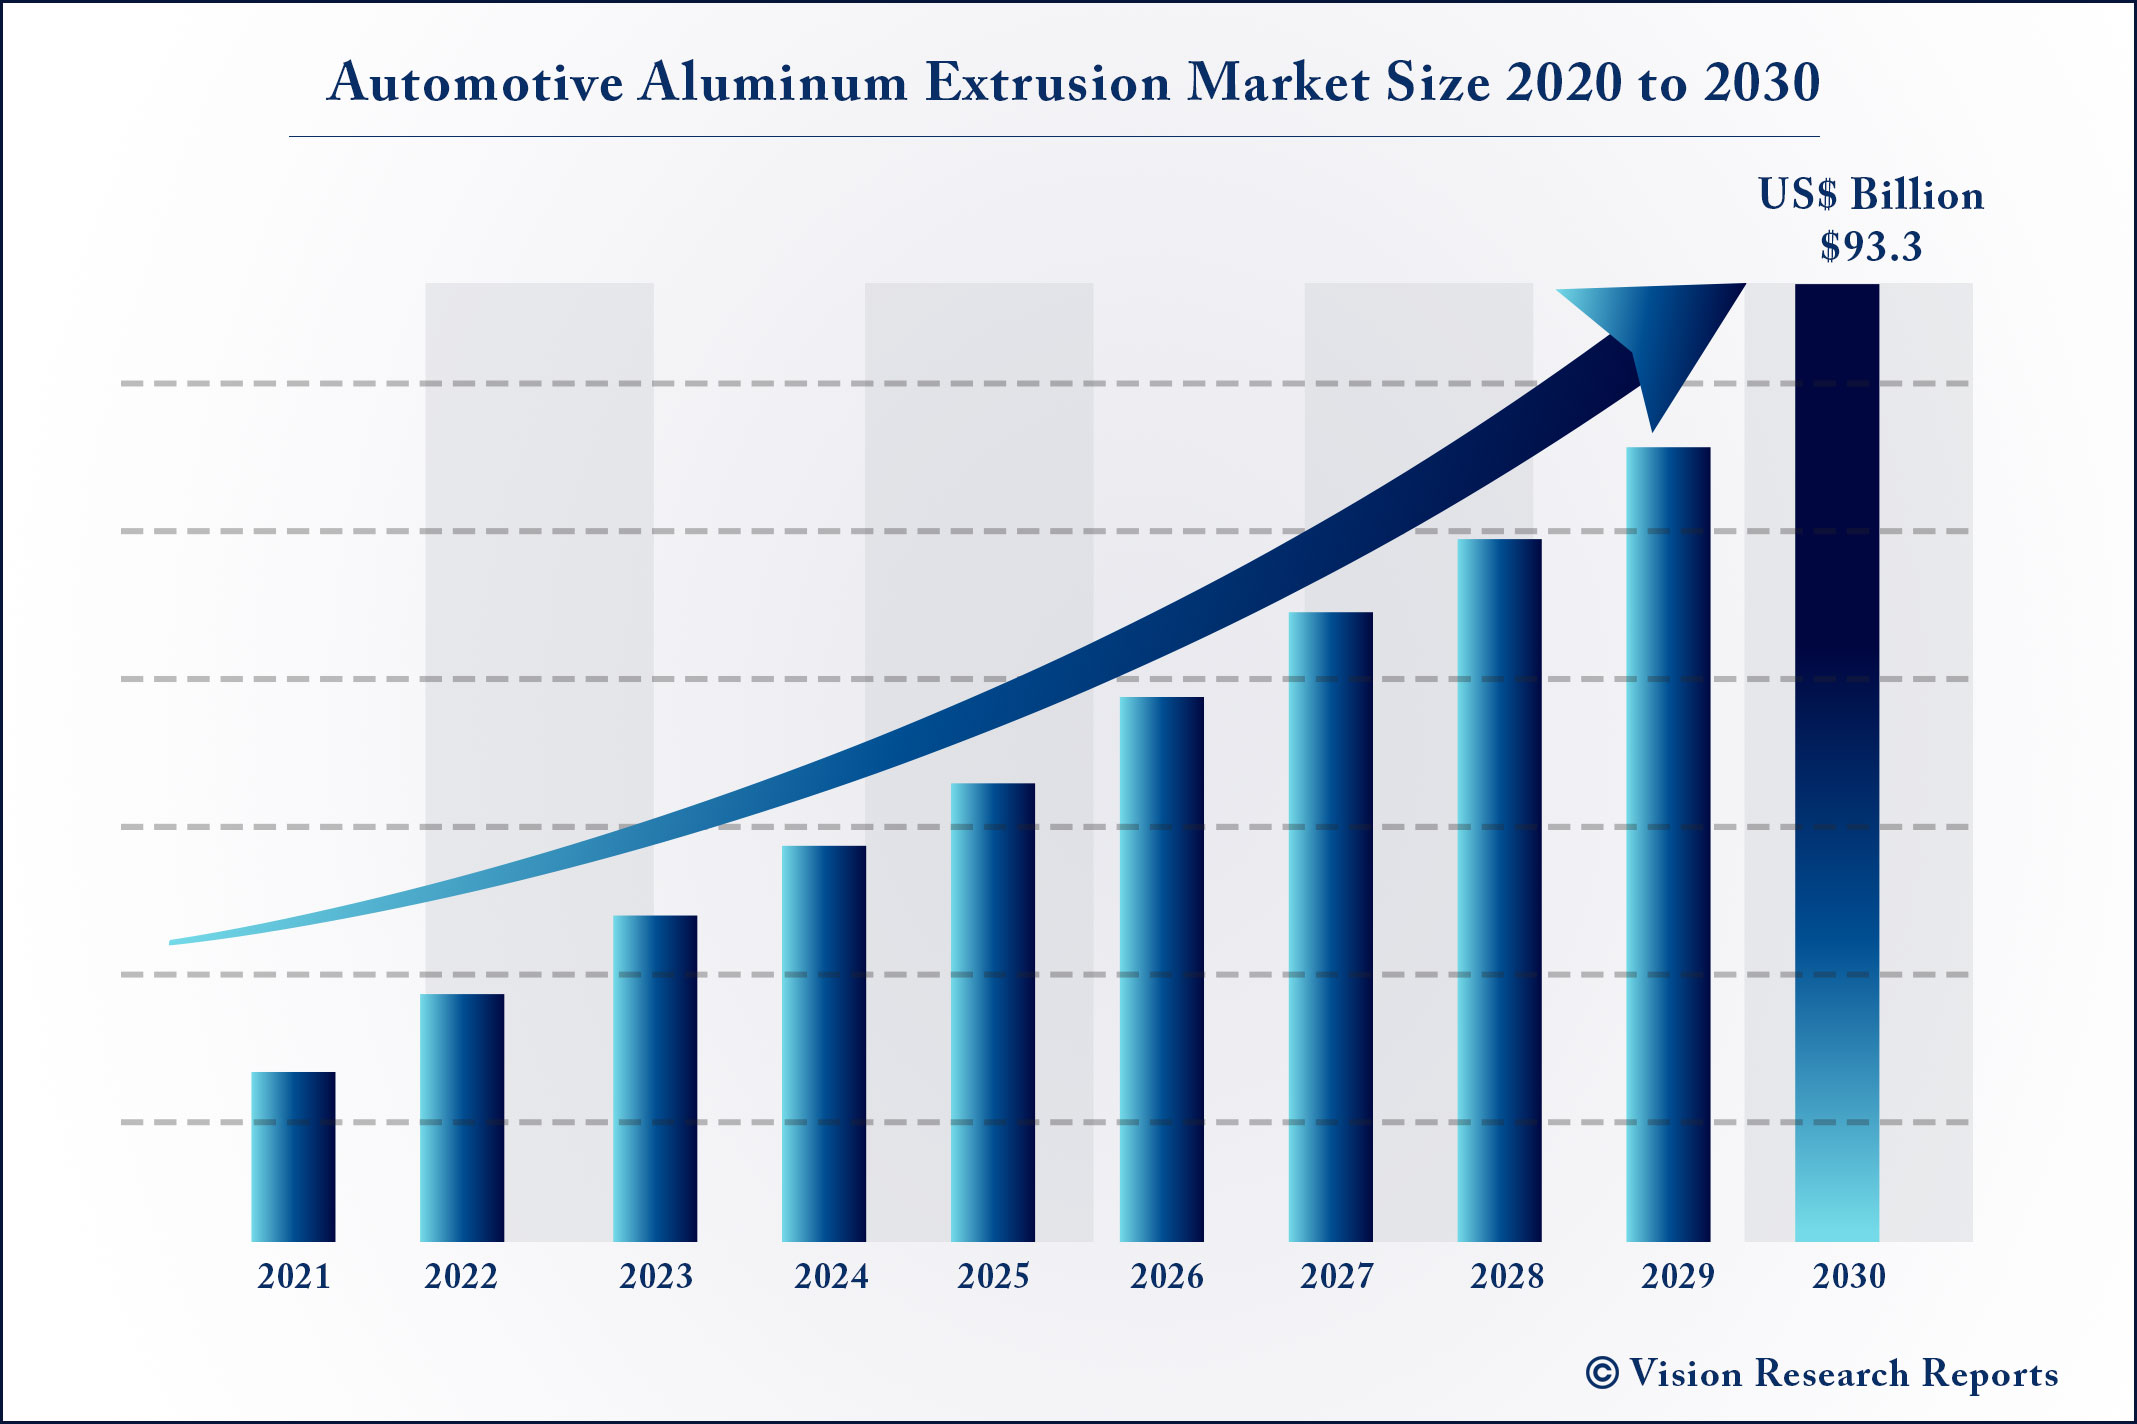 Automotive Aluminum Extrusion Market Size 2020 to 2030